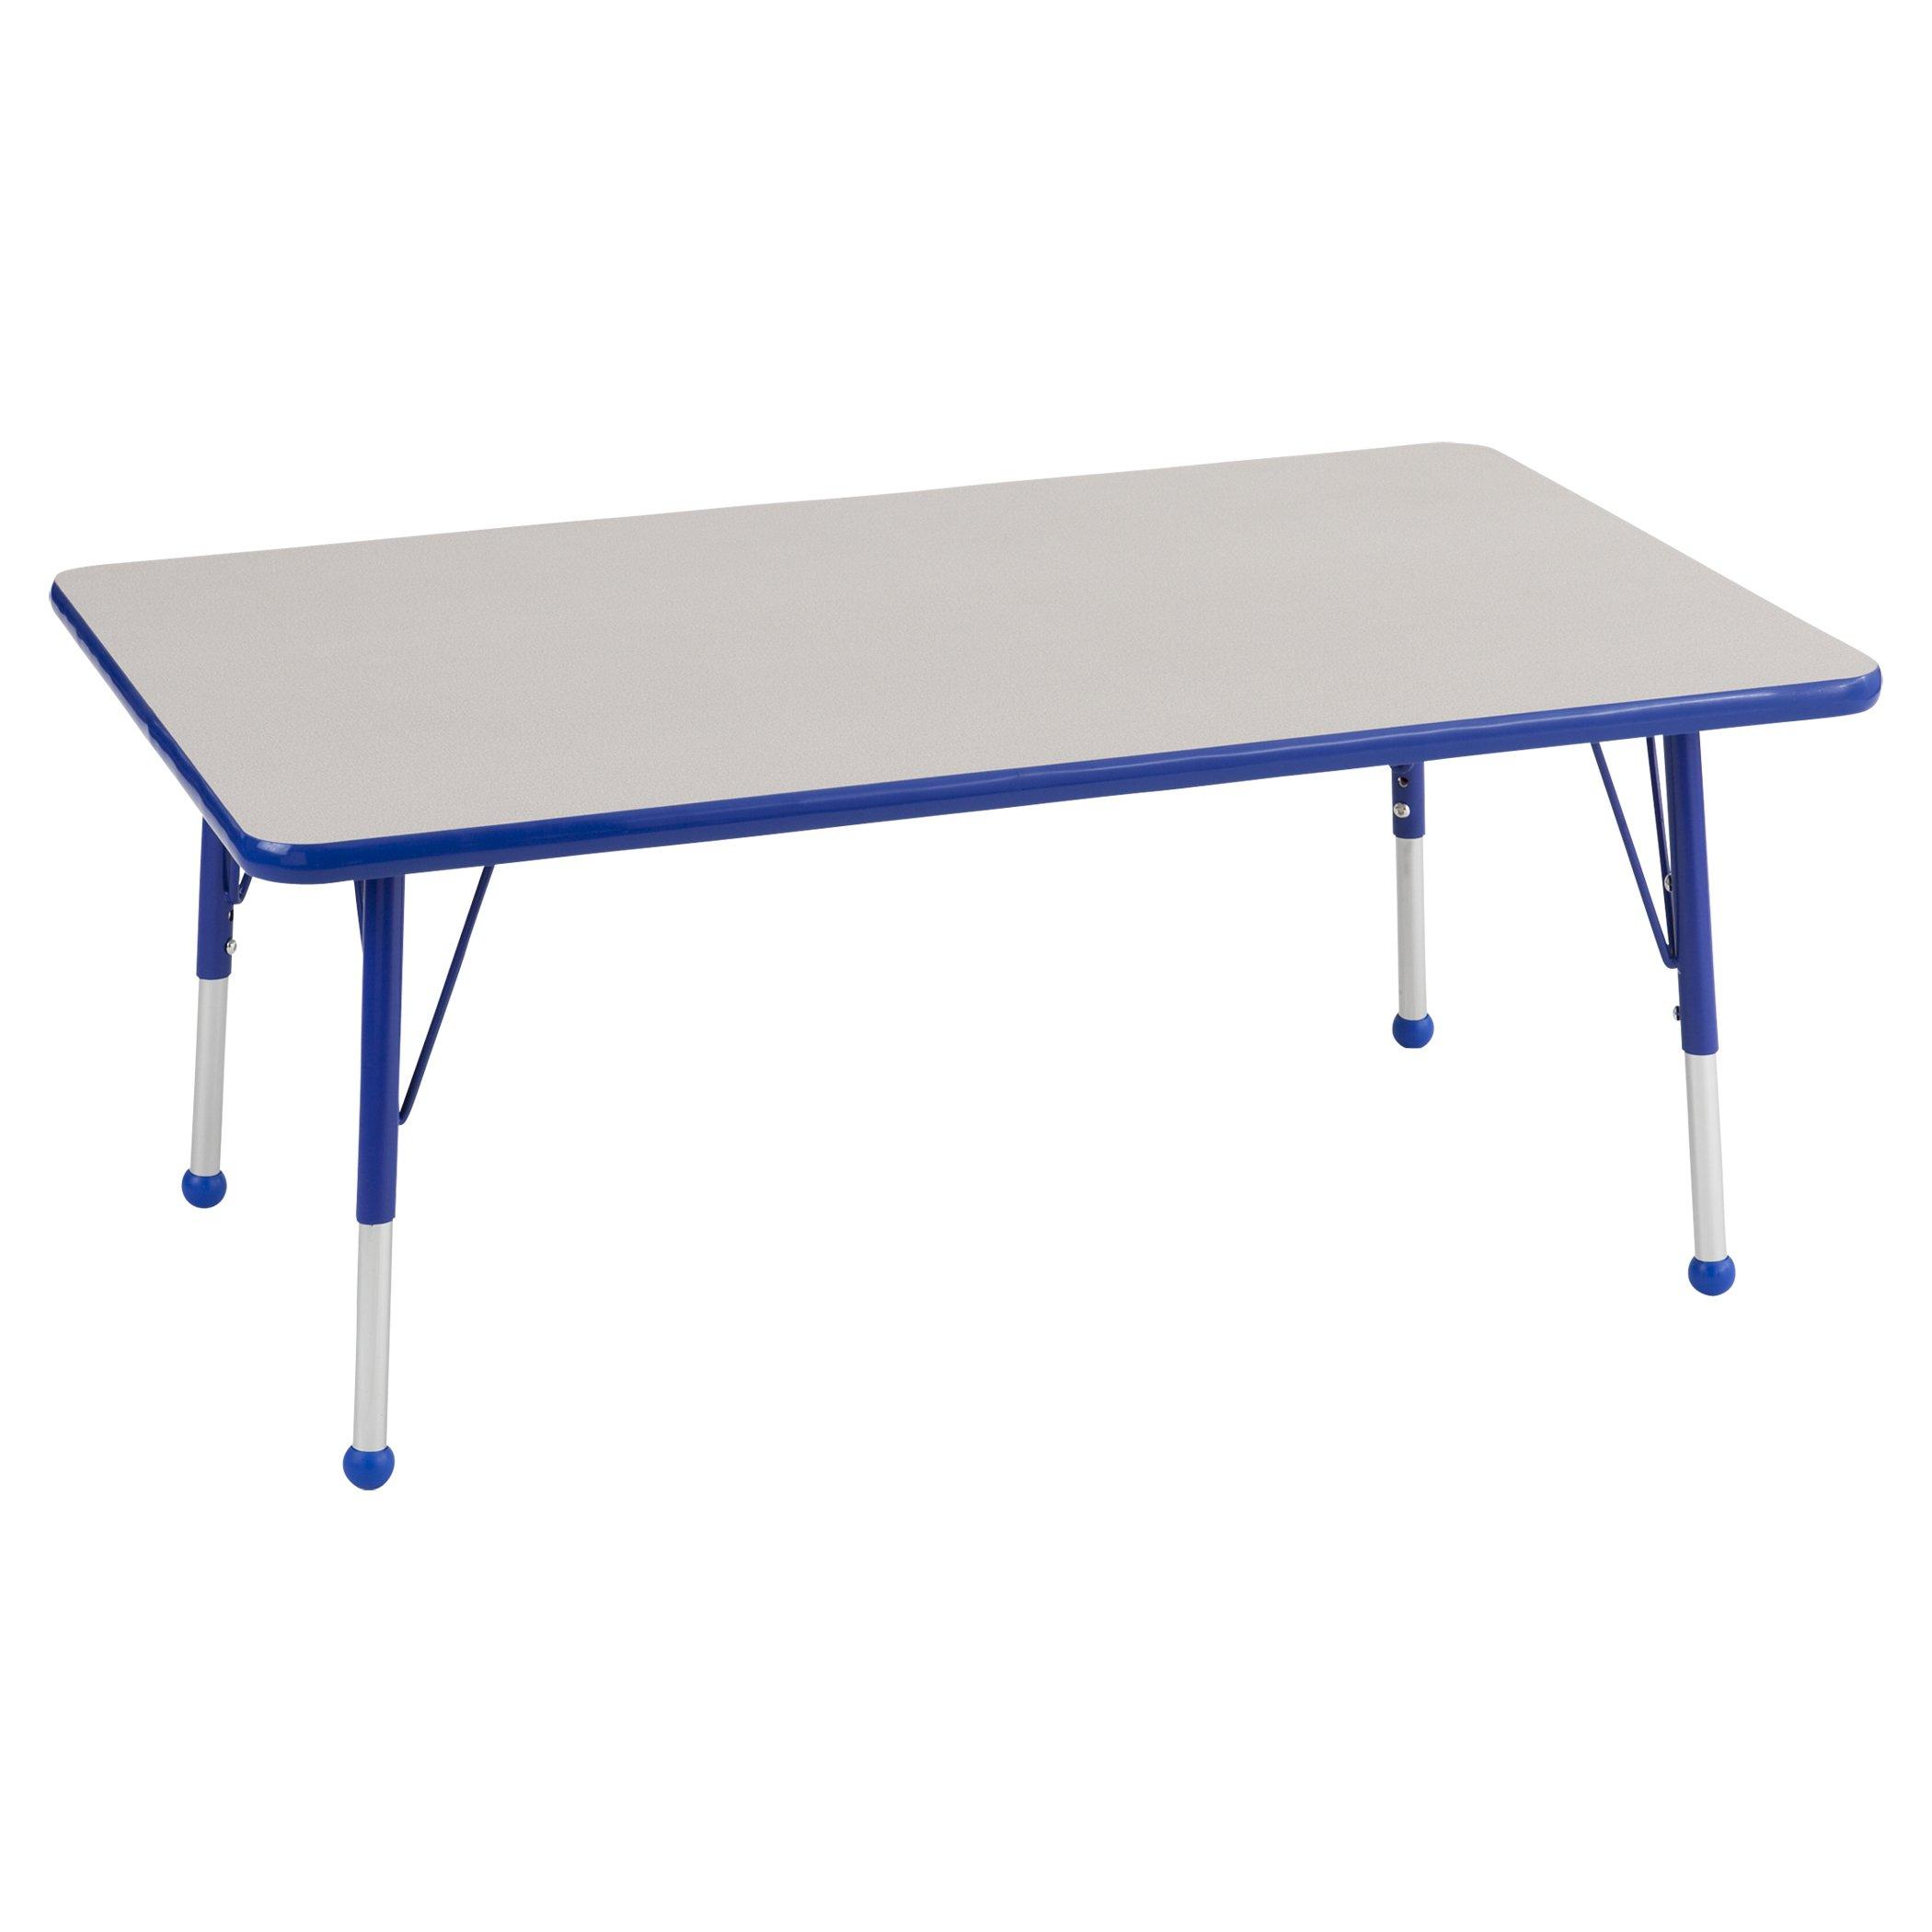 ECR4Kids 24'' x 48'' Rectangular Activity School Table, Toddler Legs w/Ball Glides, Adjustable Height 15-23 inch (Grey/Blue)